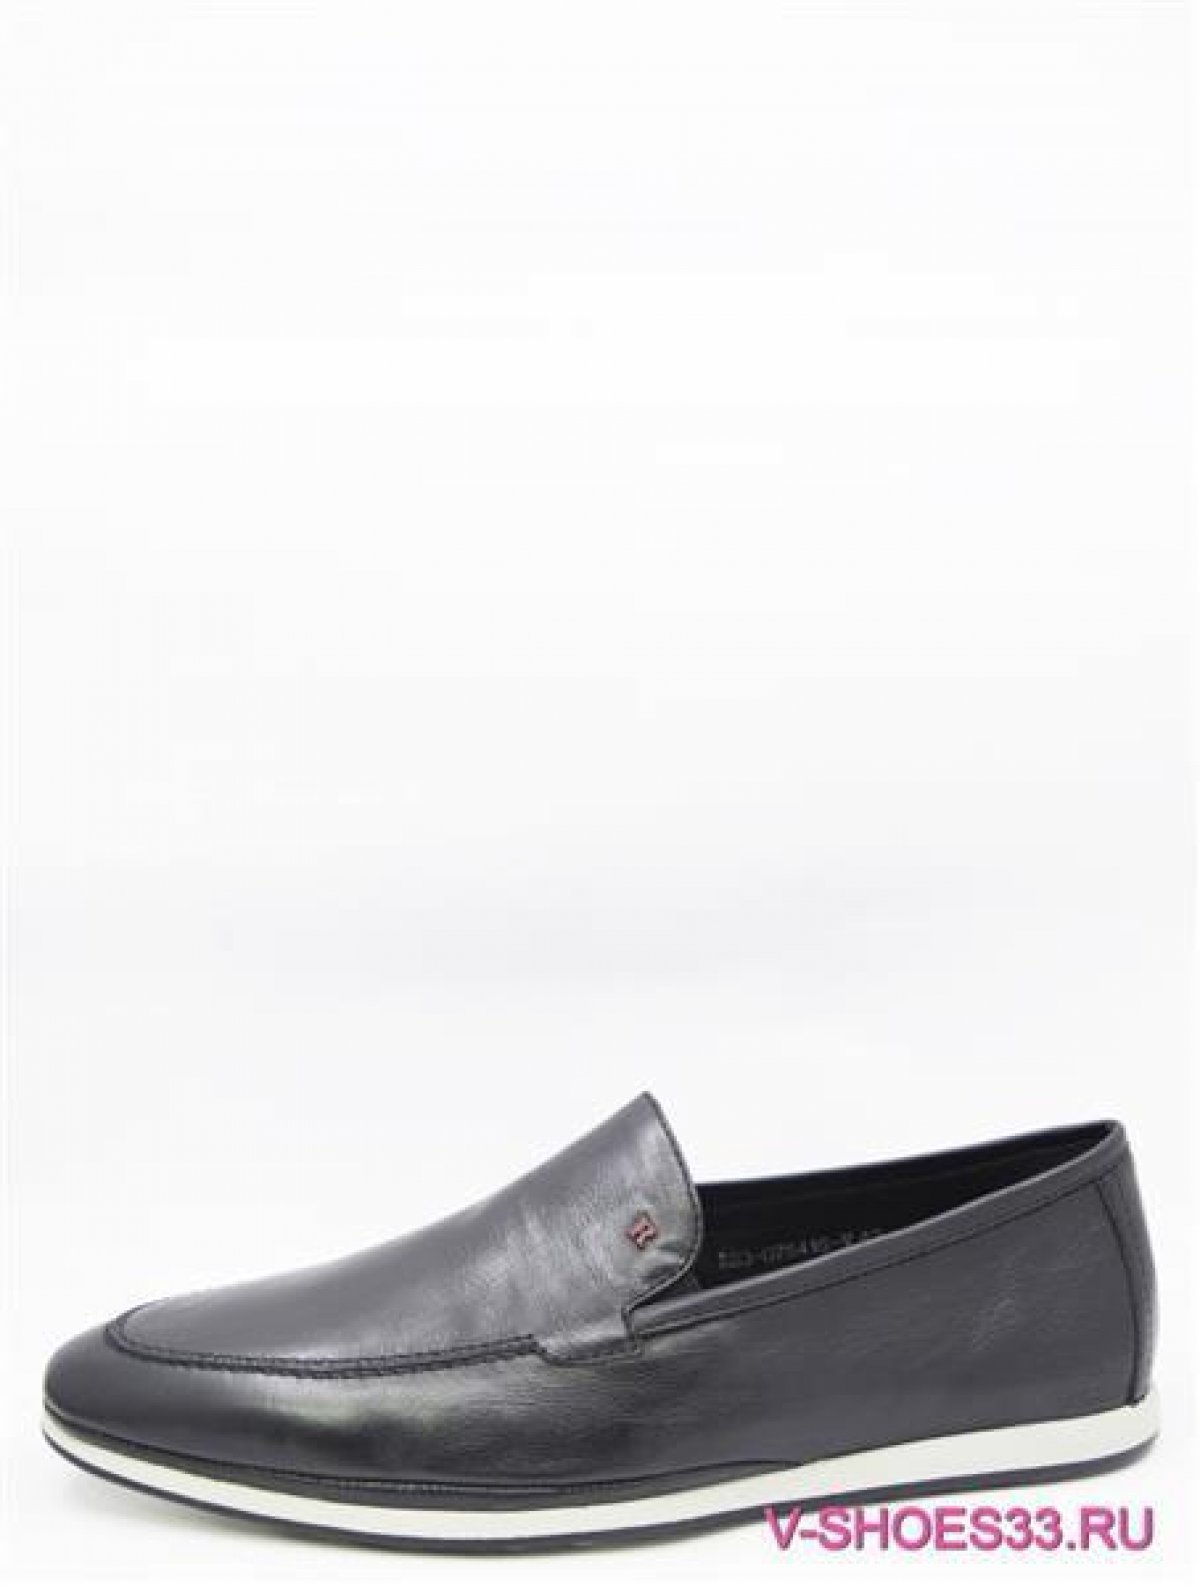 K83-075416 туфли мужские